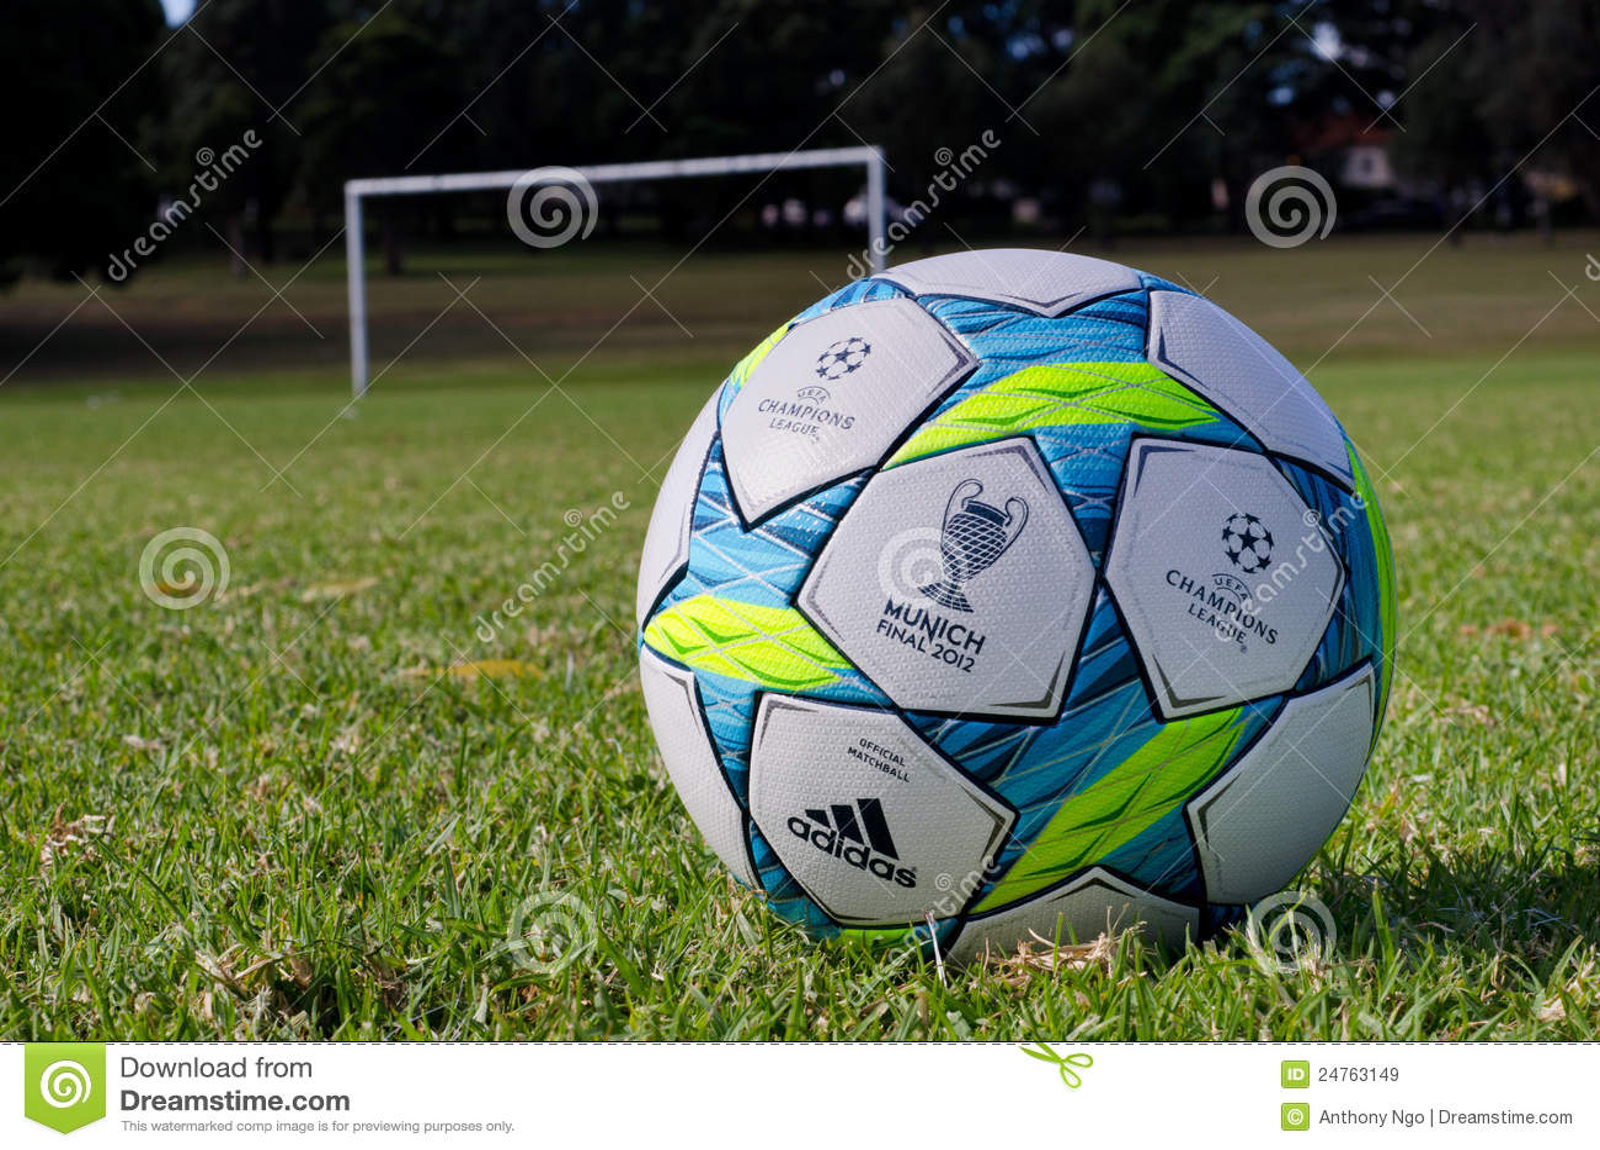 Uefa champions league ball 2012